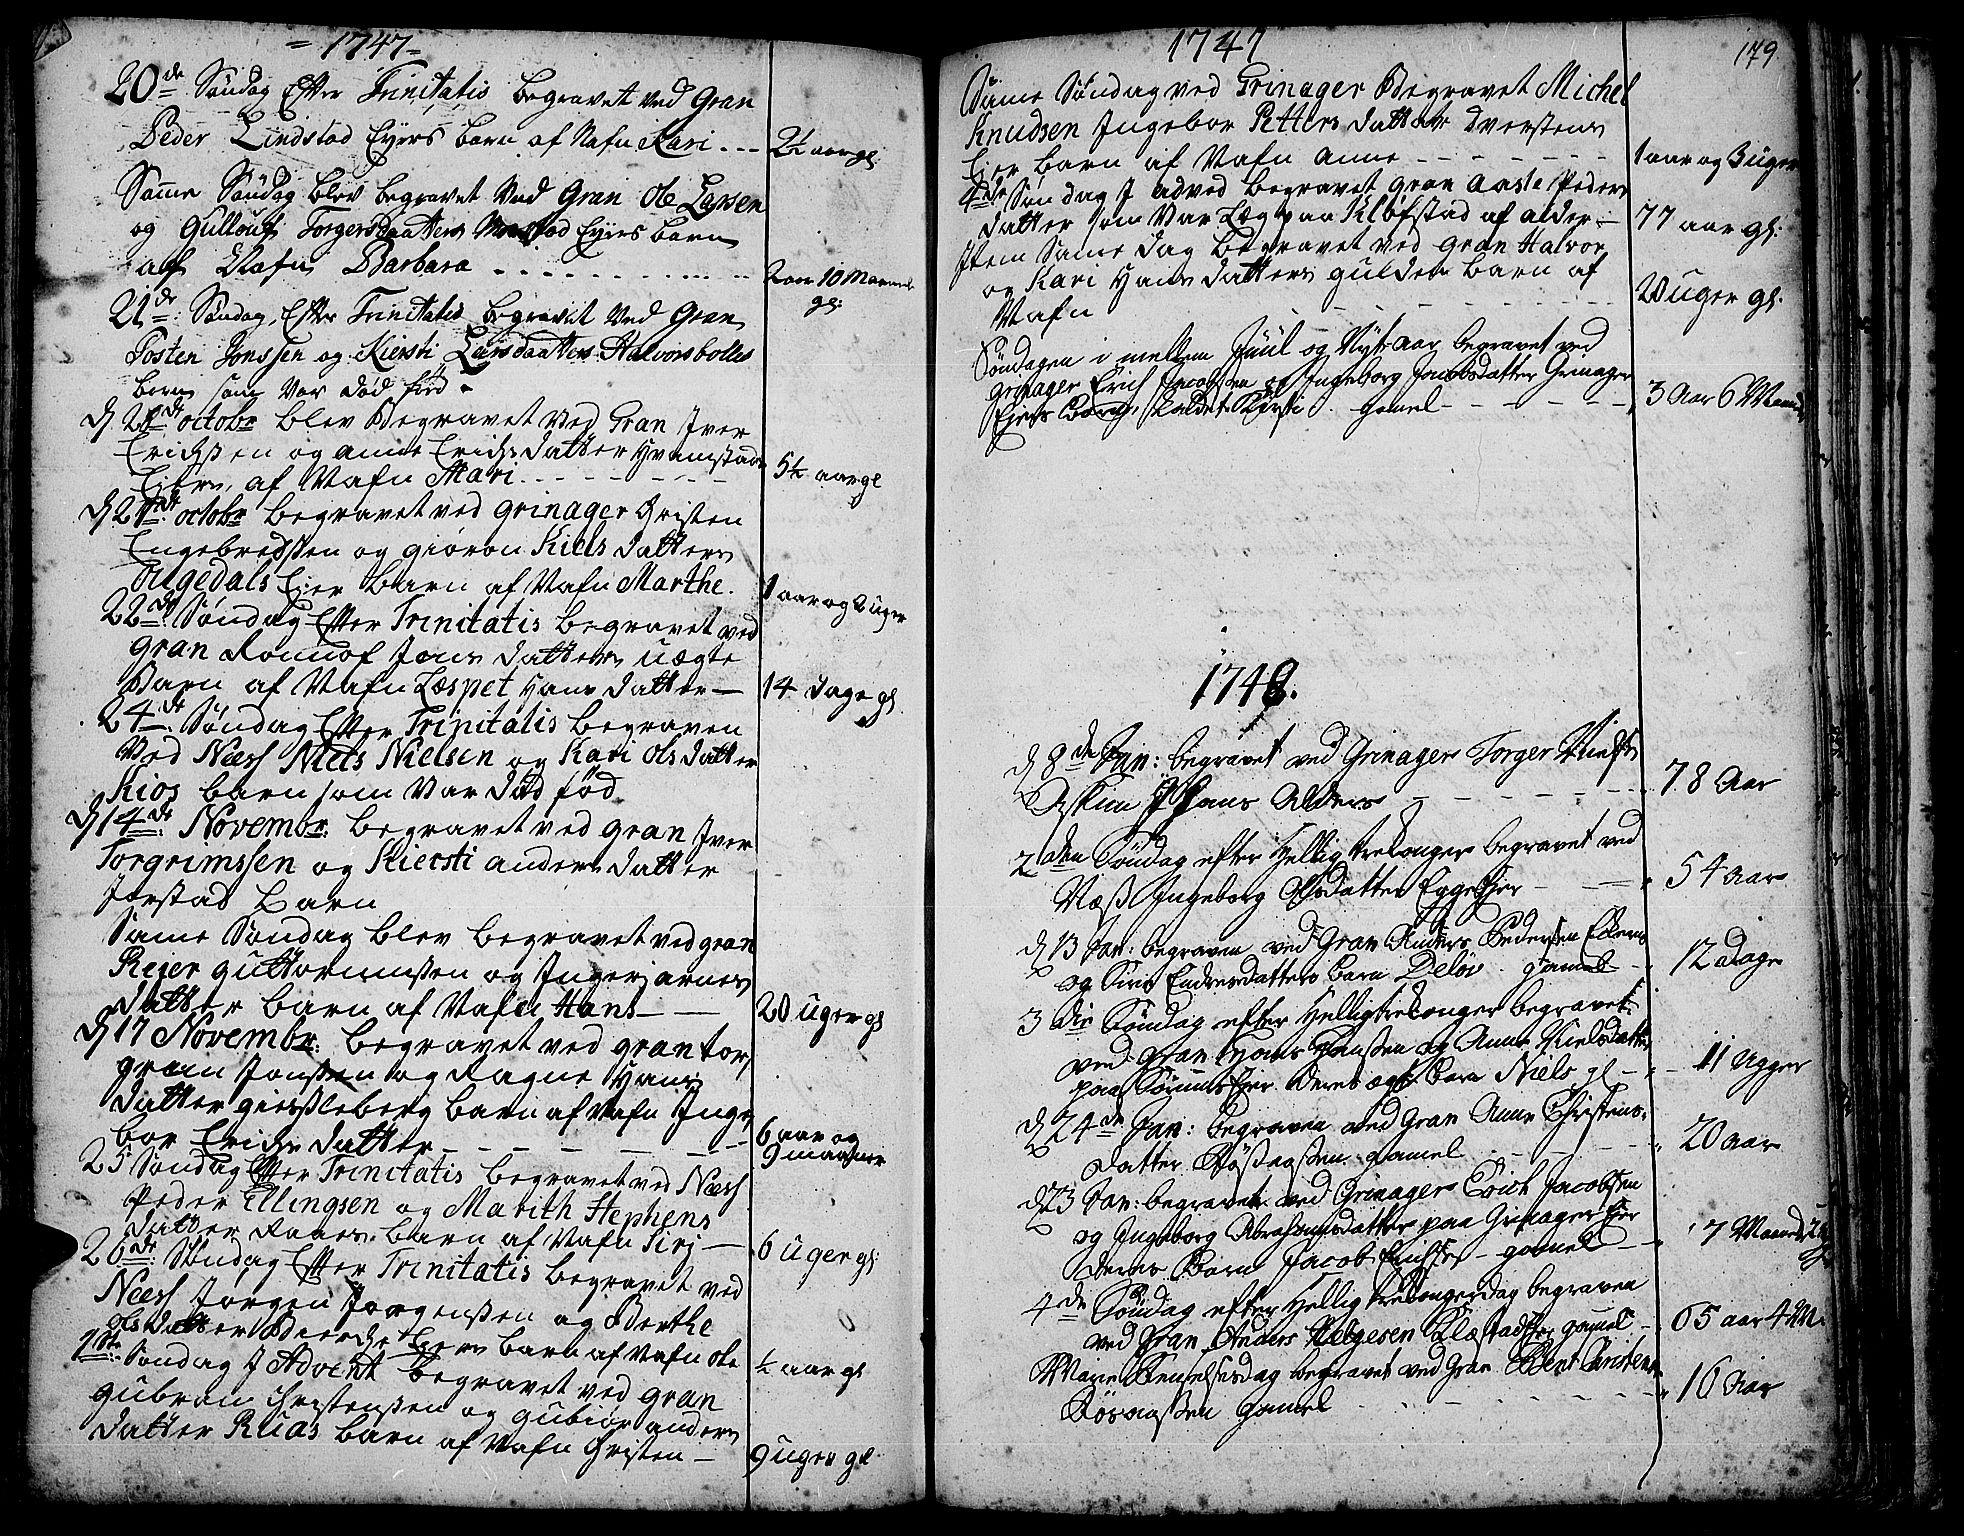 SAH, Gran prestekontor, Ministerialbok nr. 3, 1745-1758, s. 179